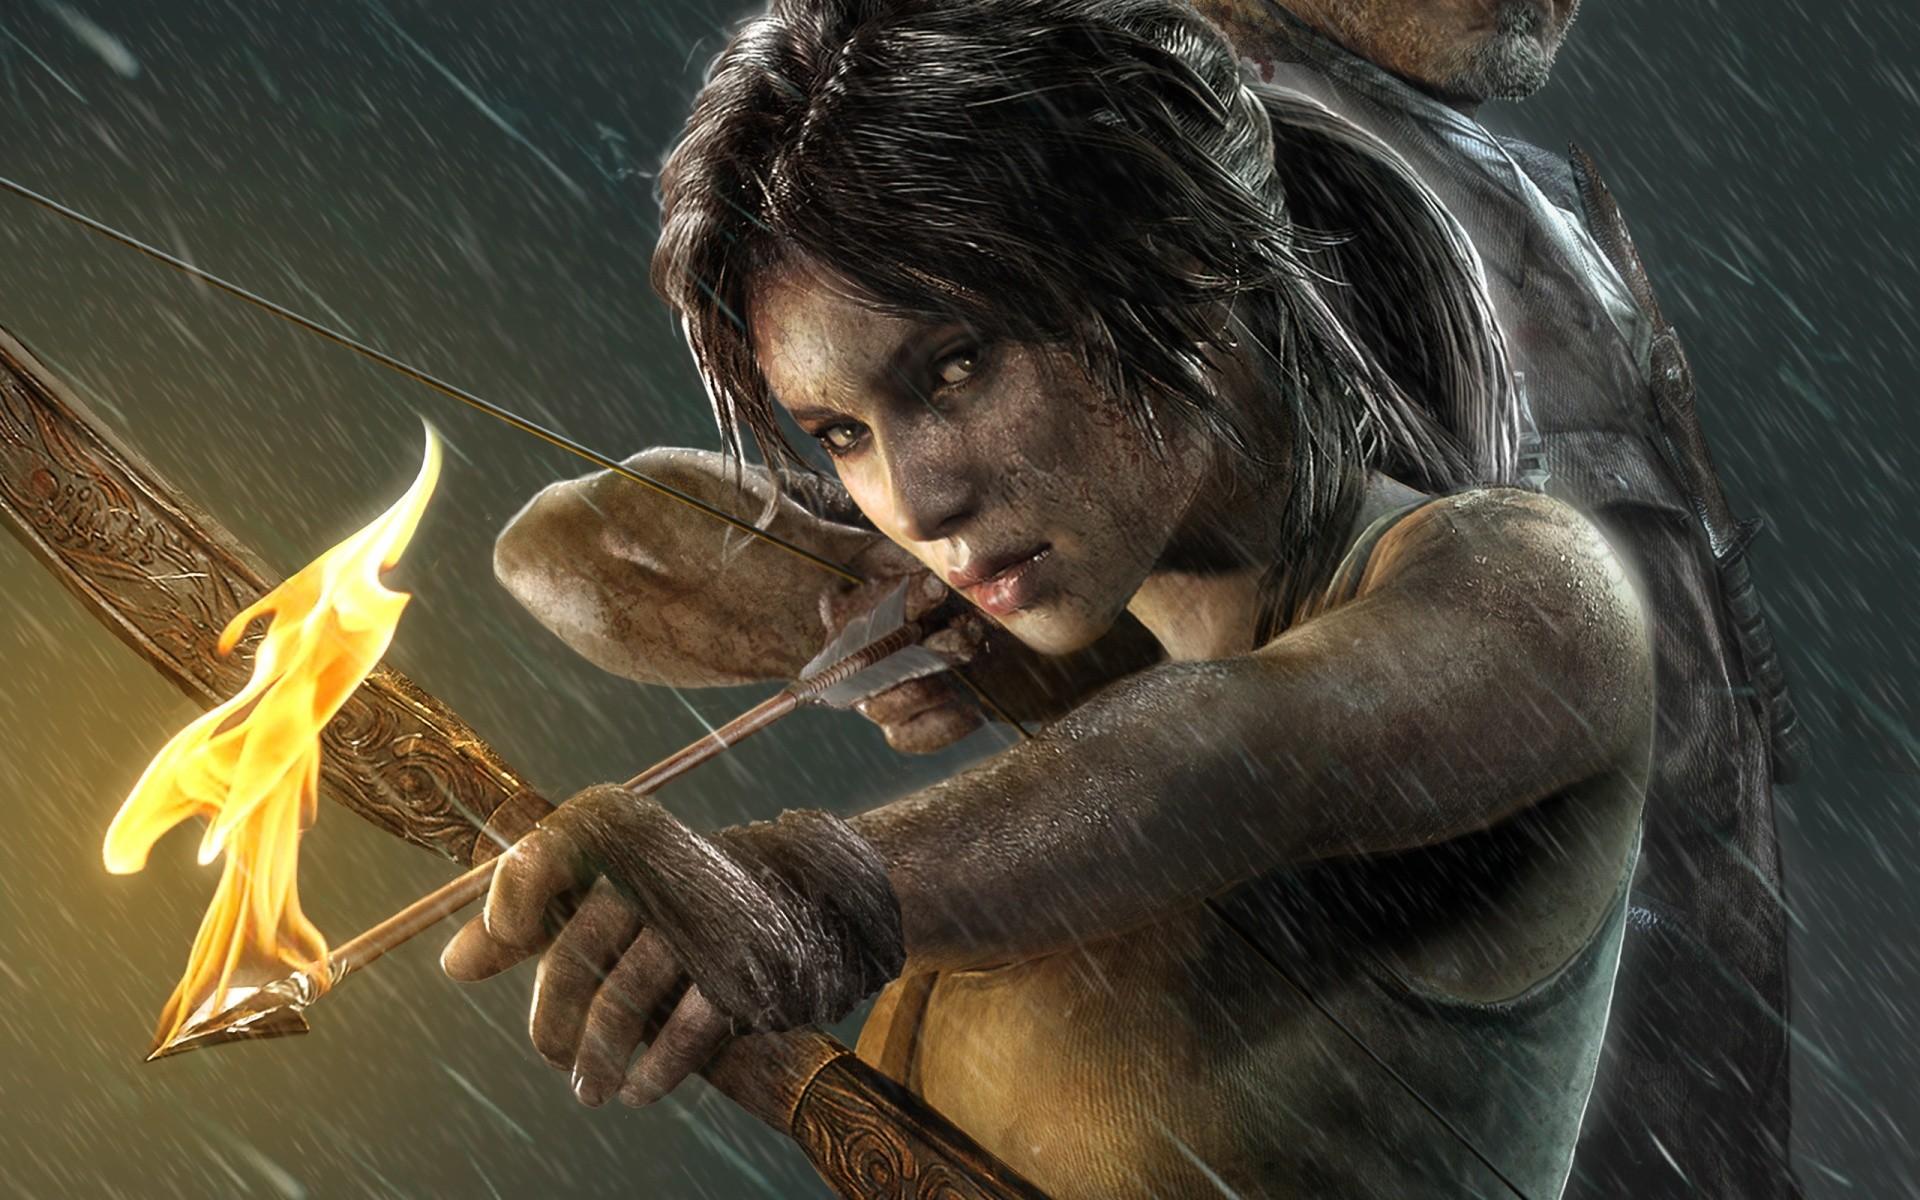 lara-croft-tomb-raider-2013-hd-game-wallpaper